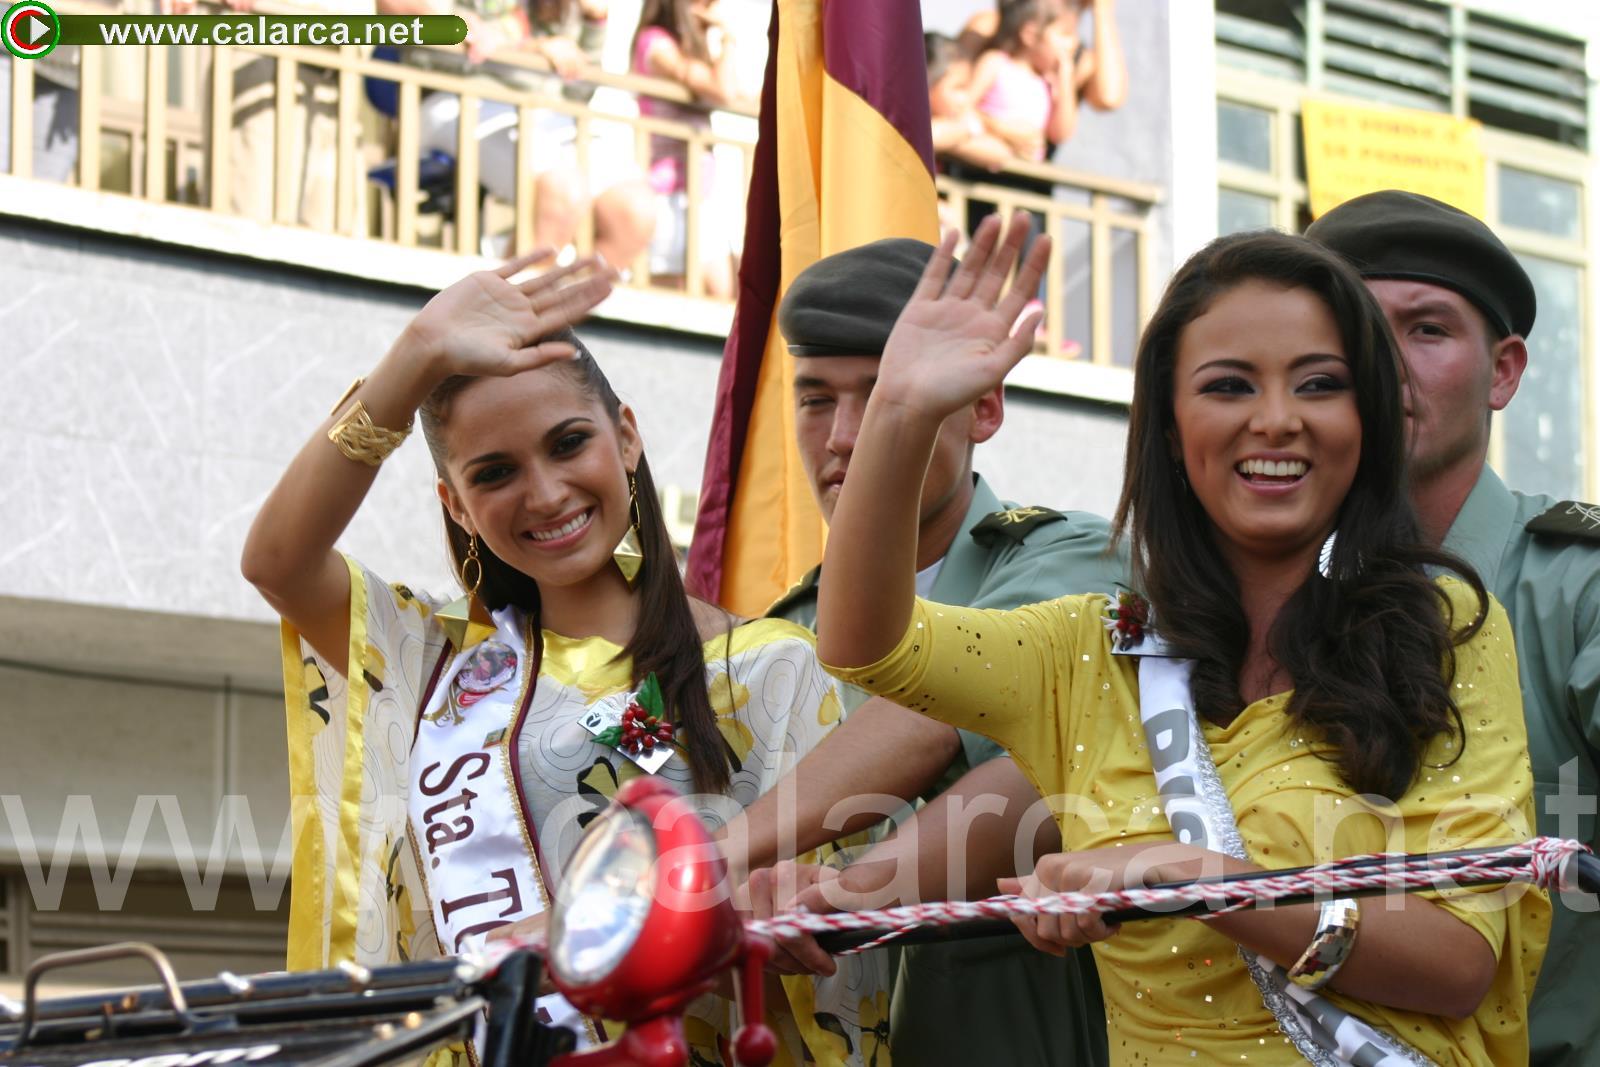 Tolima-Andrea Lizeth Lizarazo; Risaralda-Andrea Marcela Agudelo Ramírez